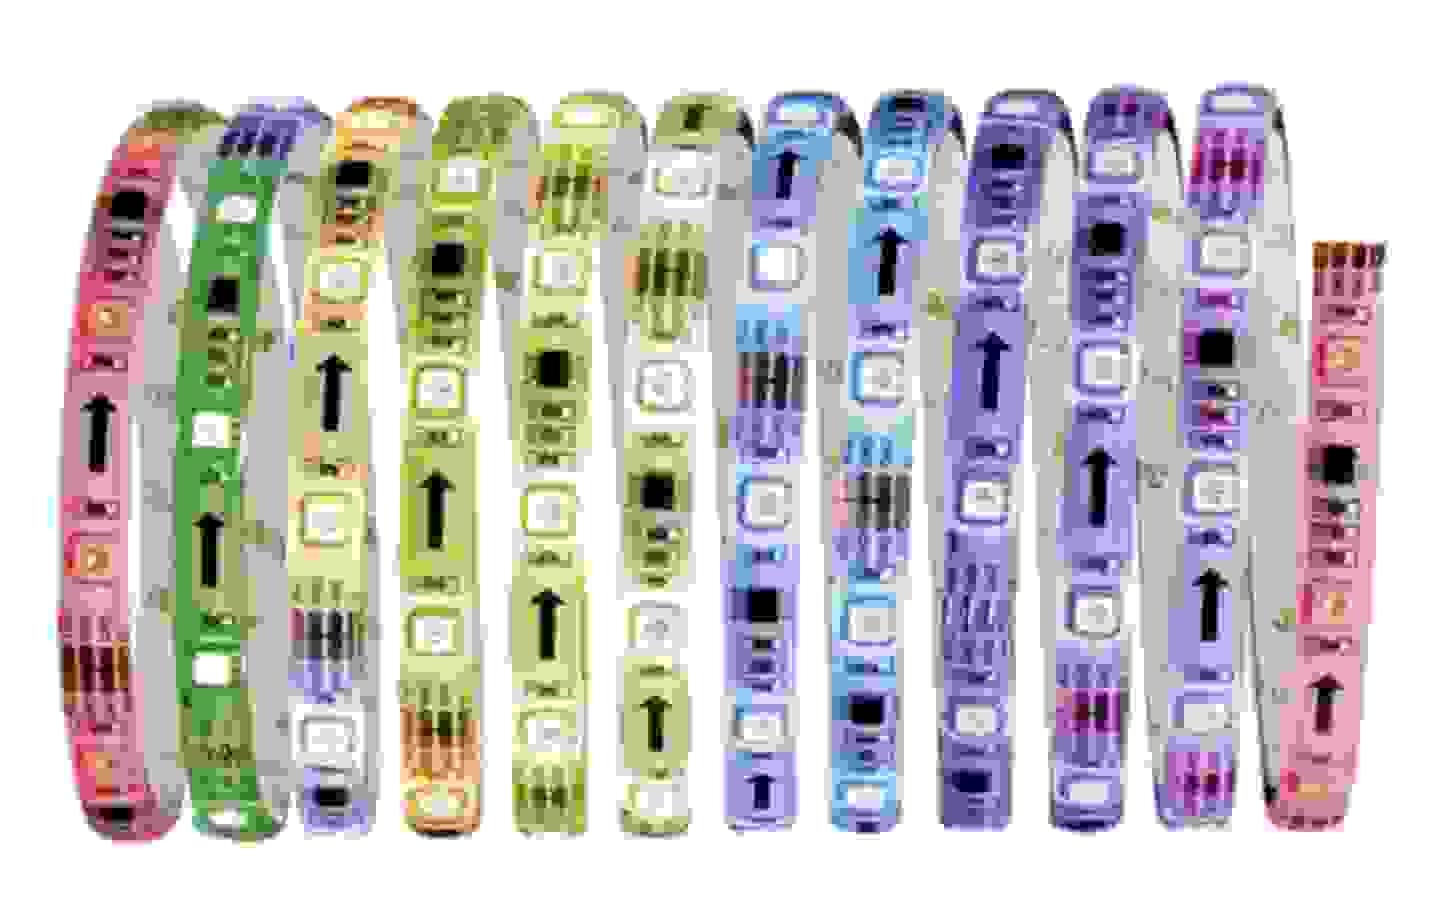 LED-Streifen – die LED-Stripes